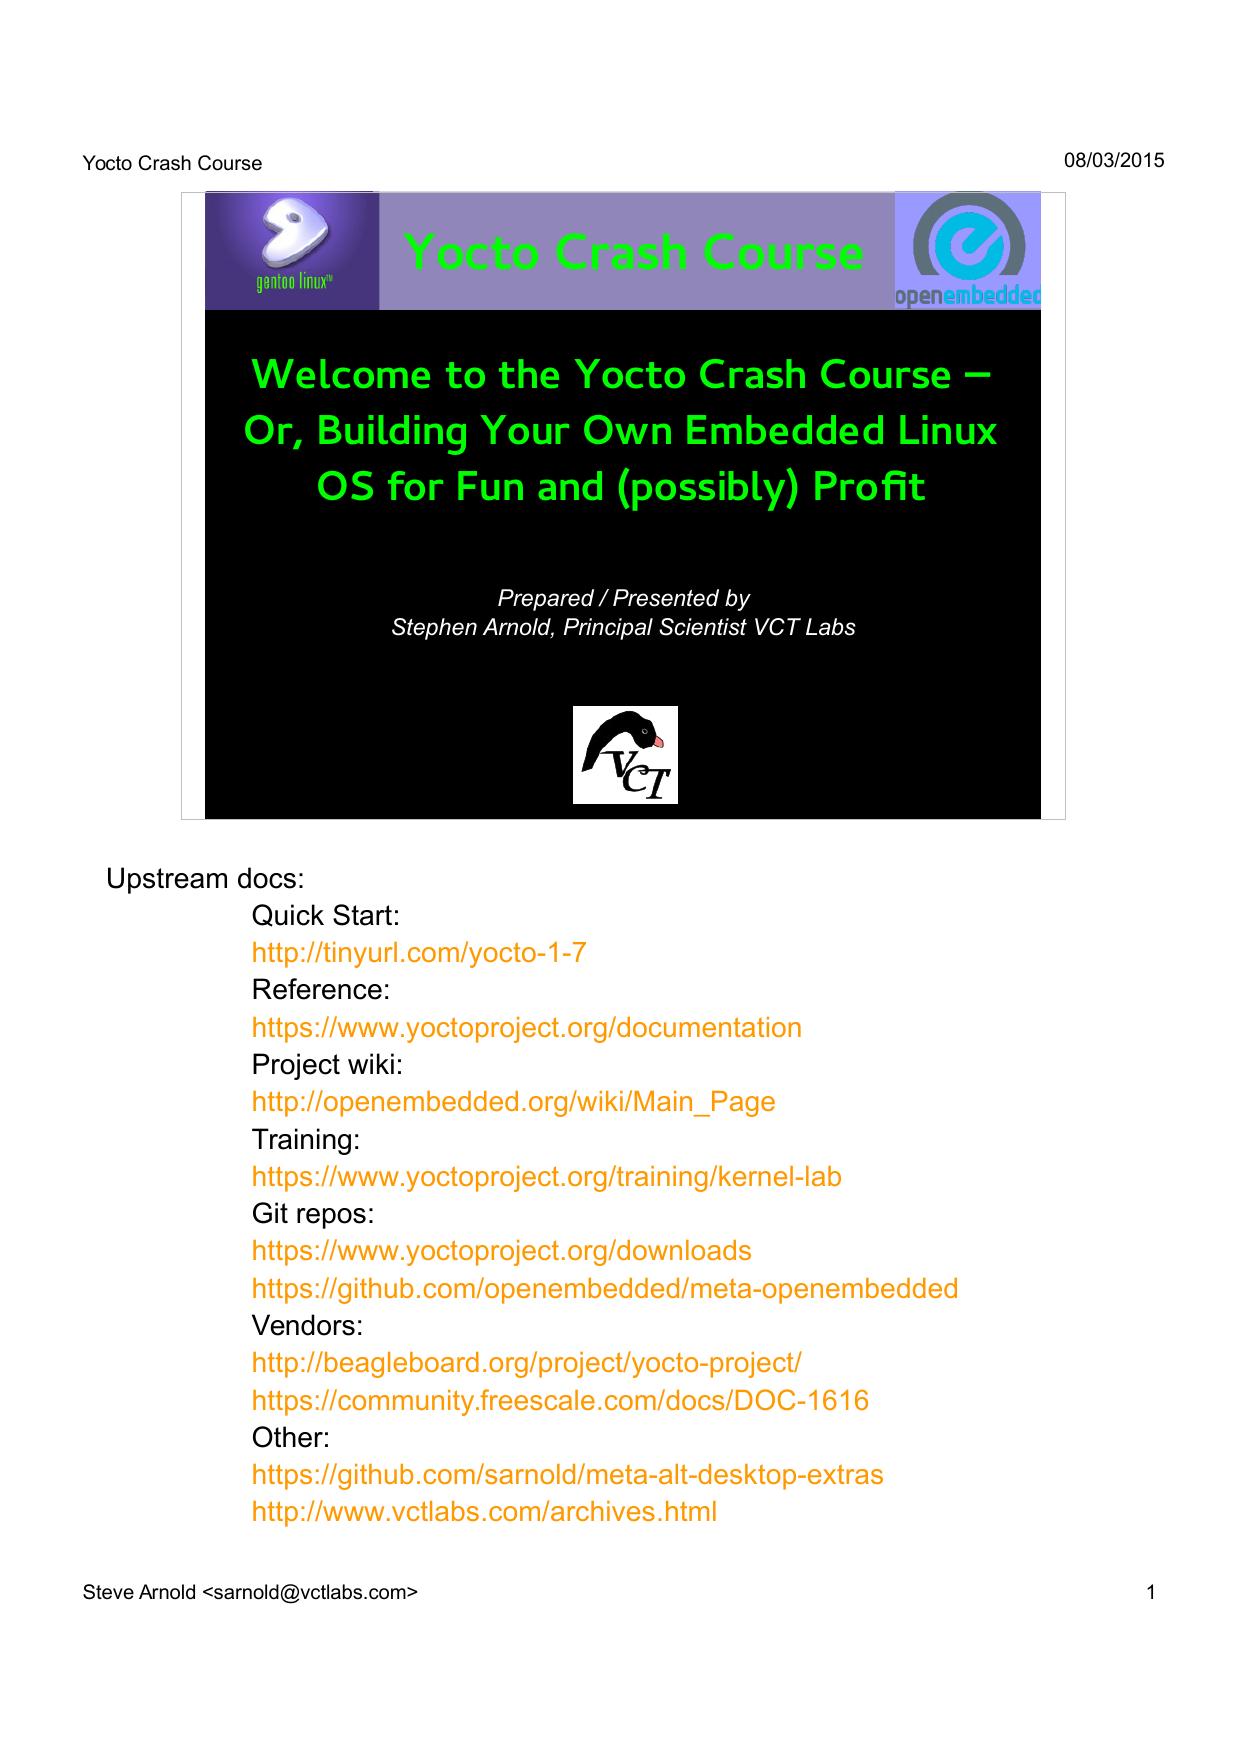 Yocto Crash Course | manualzz com